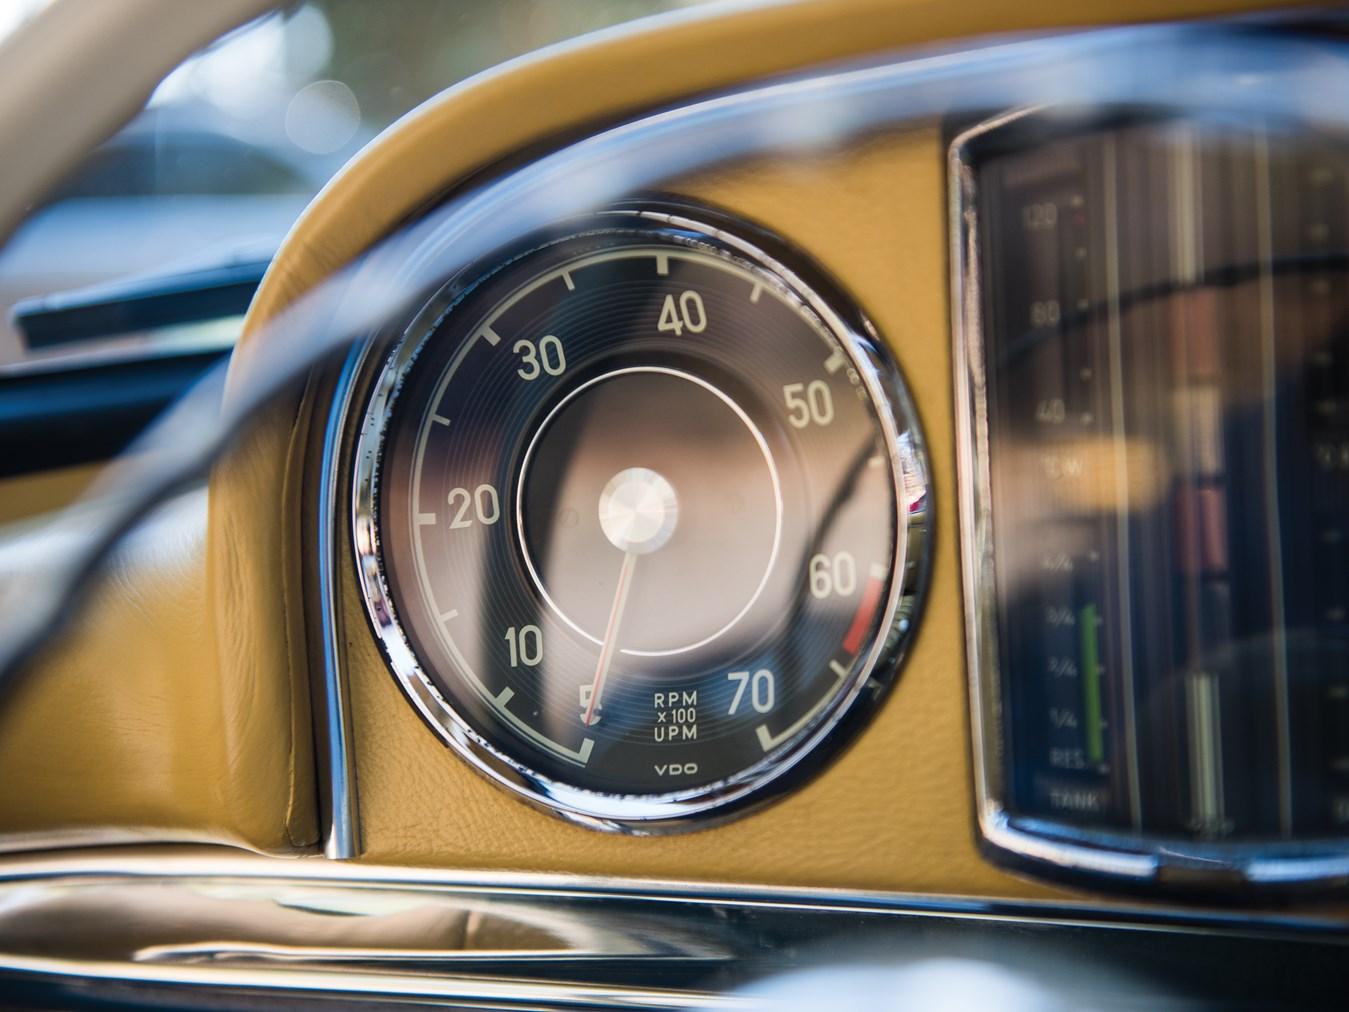 1962 Mercedes-Benz 300 SL Roadster